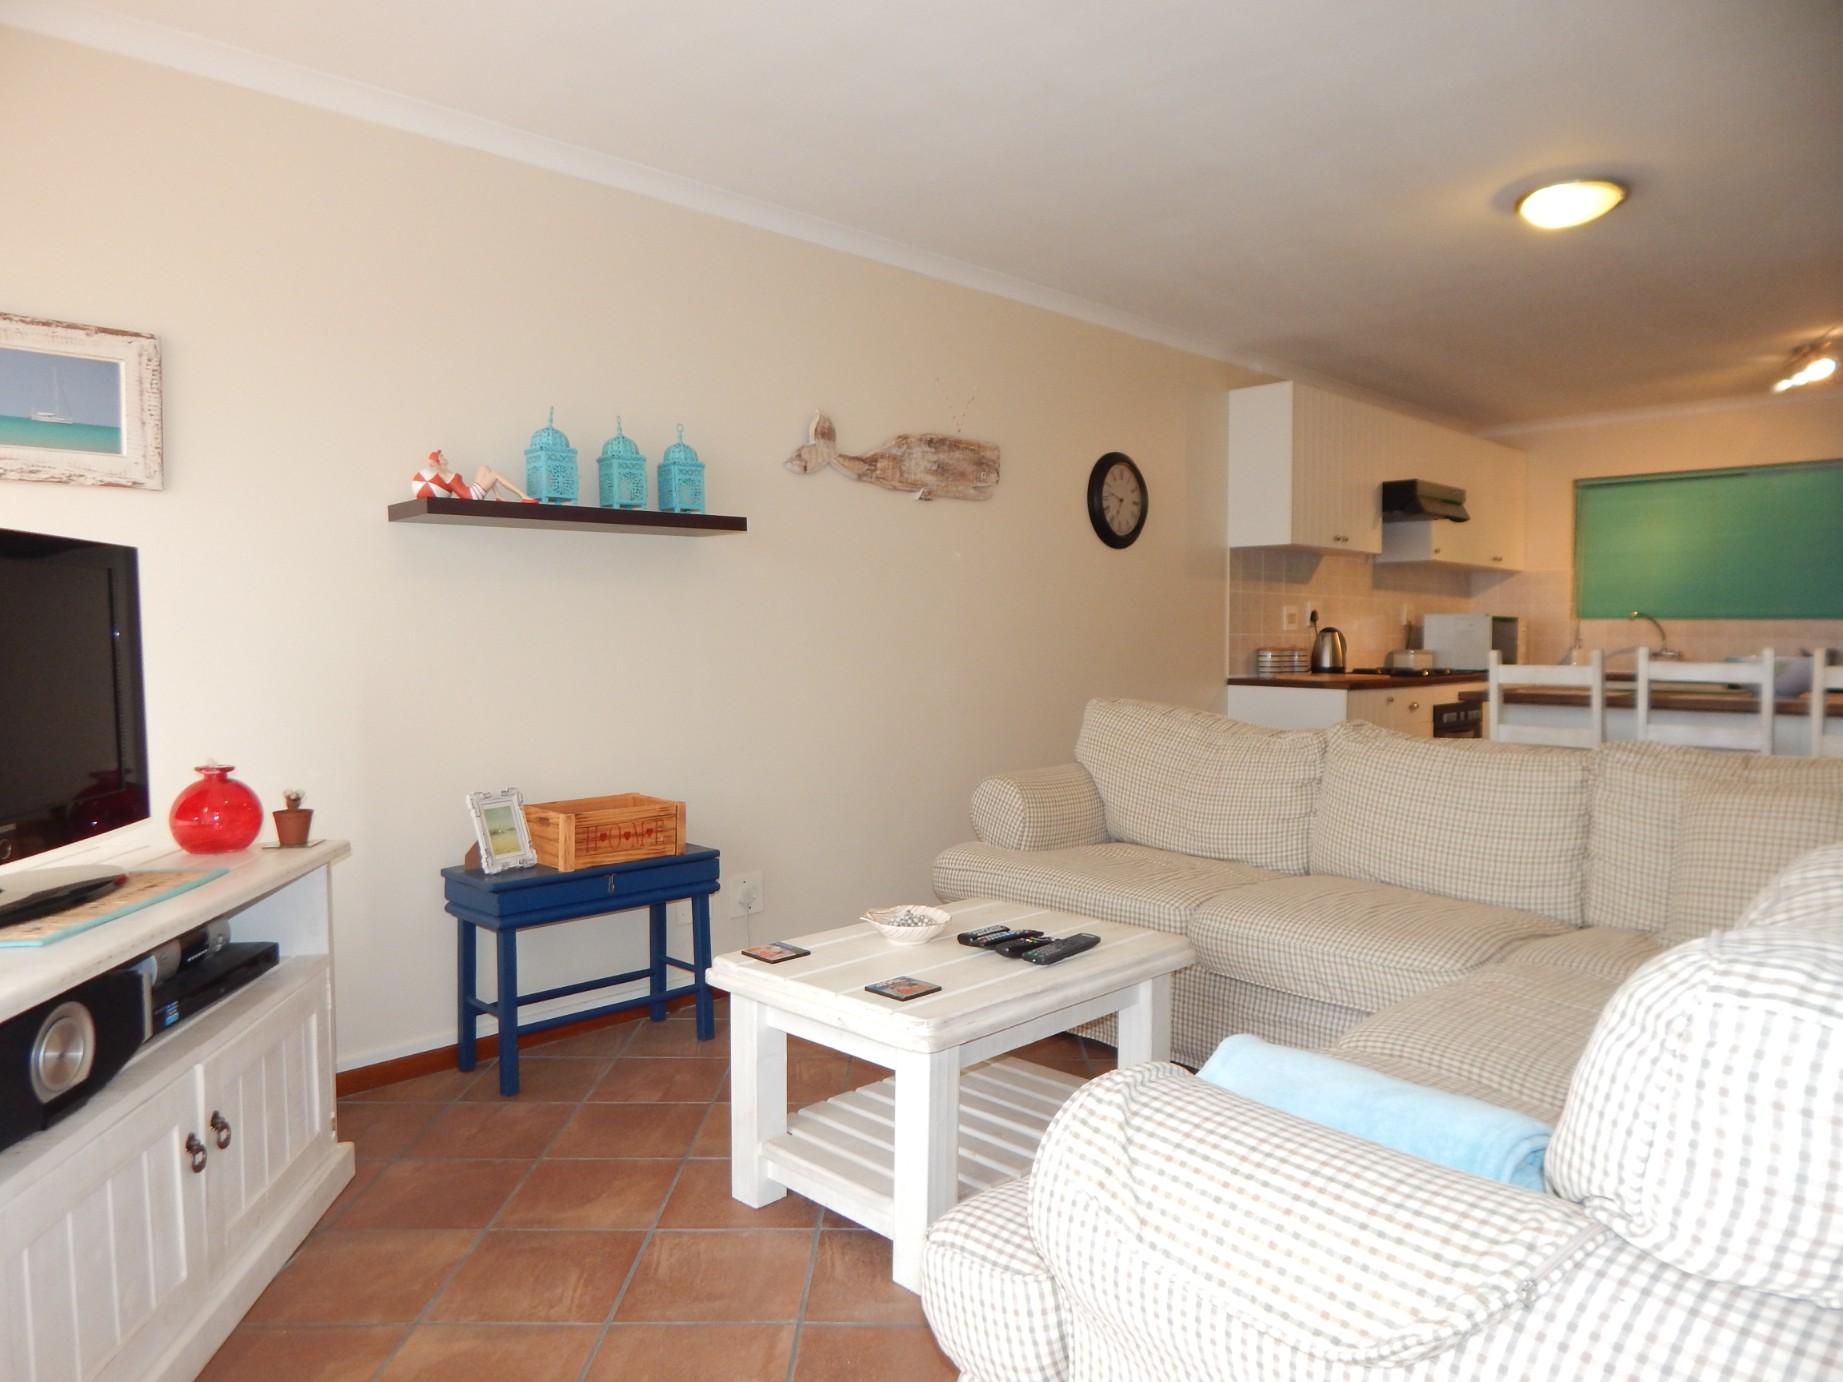 3 Bedroom Apartment for sale in De Bakke ENT0066483 : photo#1